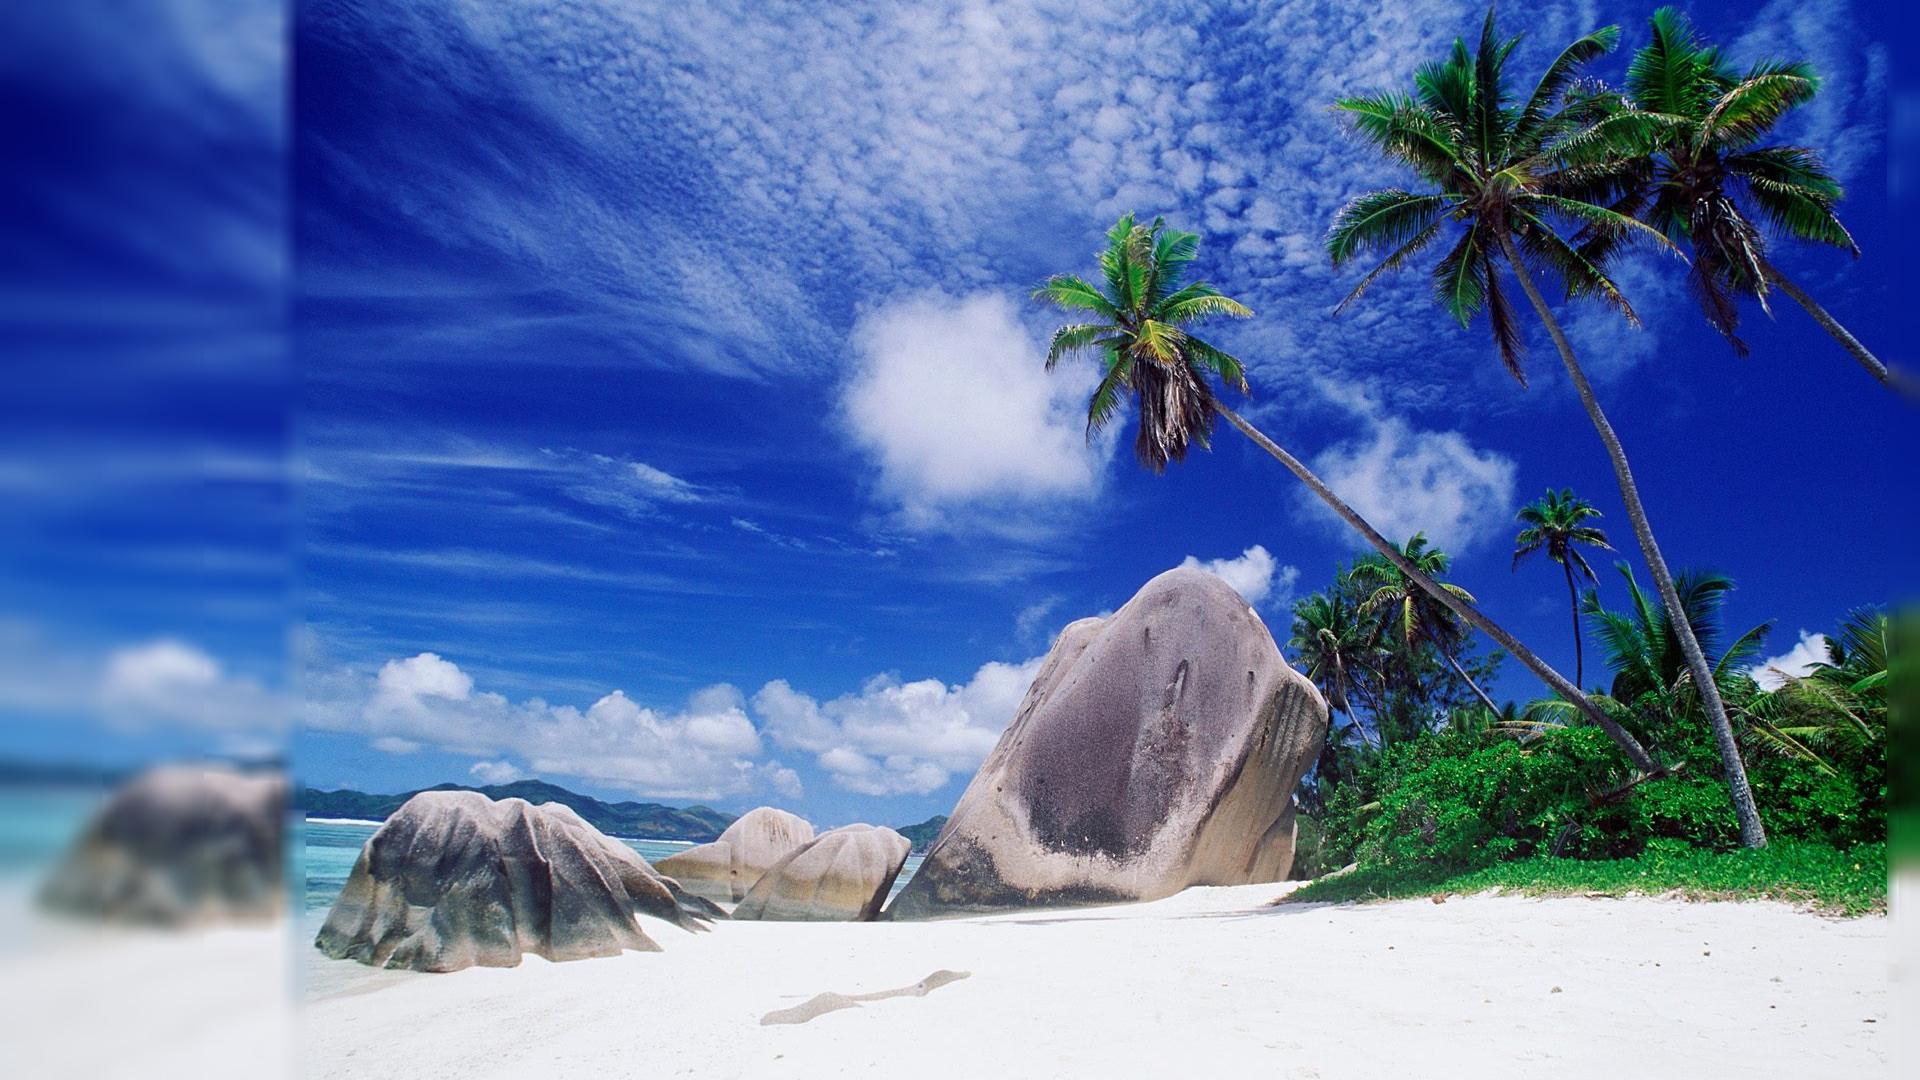 Tropical Computer Wallpaper | Desktop Image